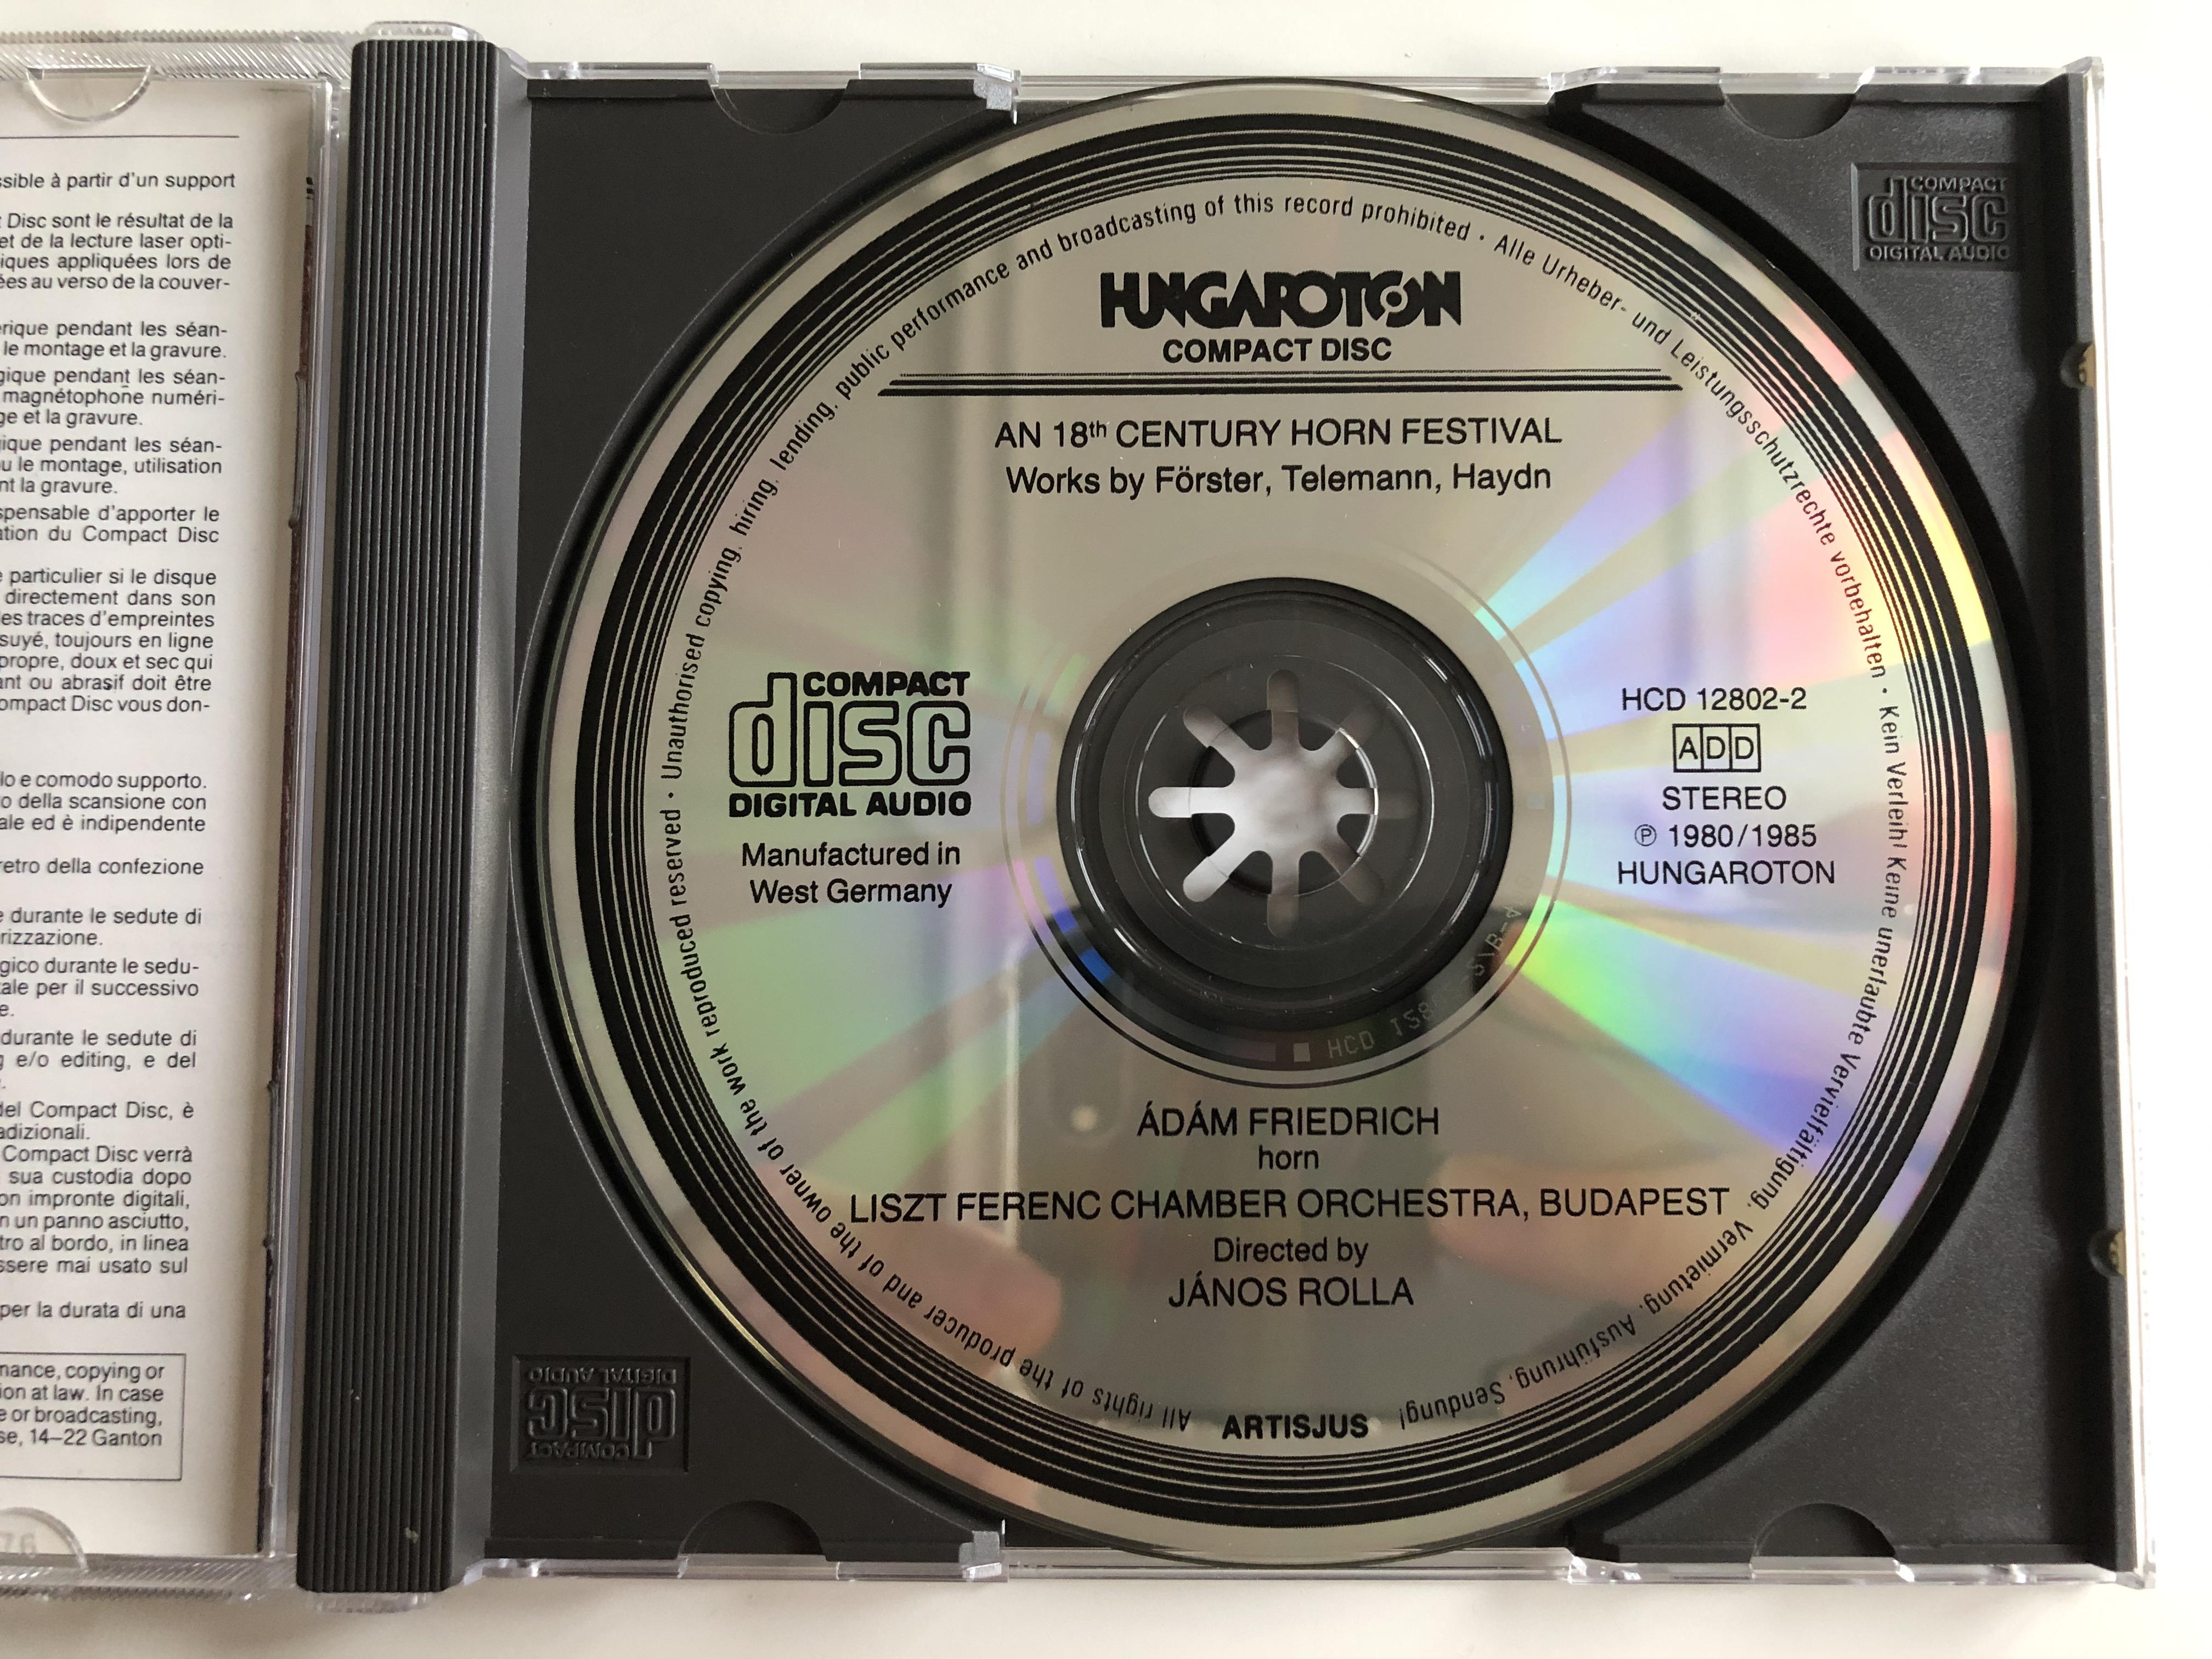 an-18th-century-horn-festival-forster-telemann-haydn-adam-friedrich-liszt-ferenc-chamber-orchestra-budapest-janos-rolla-hungaroton-audio-cd-stereo-hcd-12802-2-6-.jpg